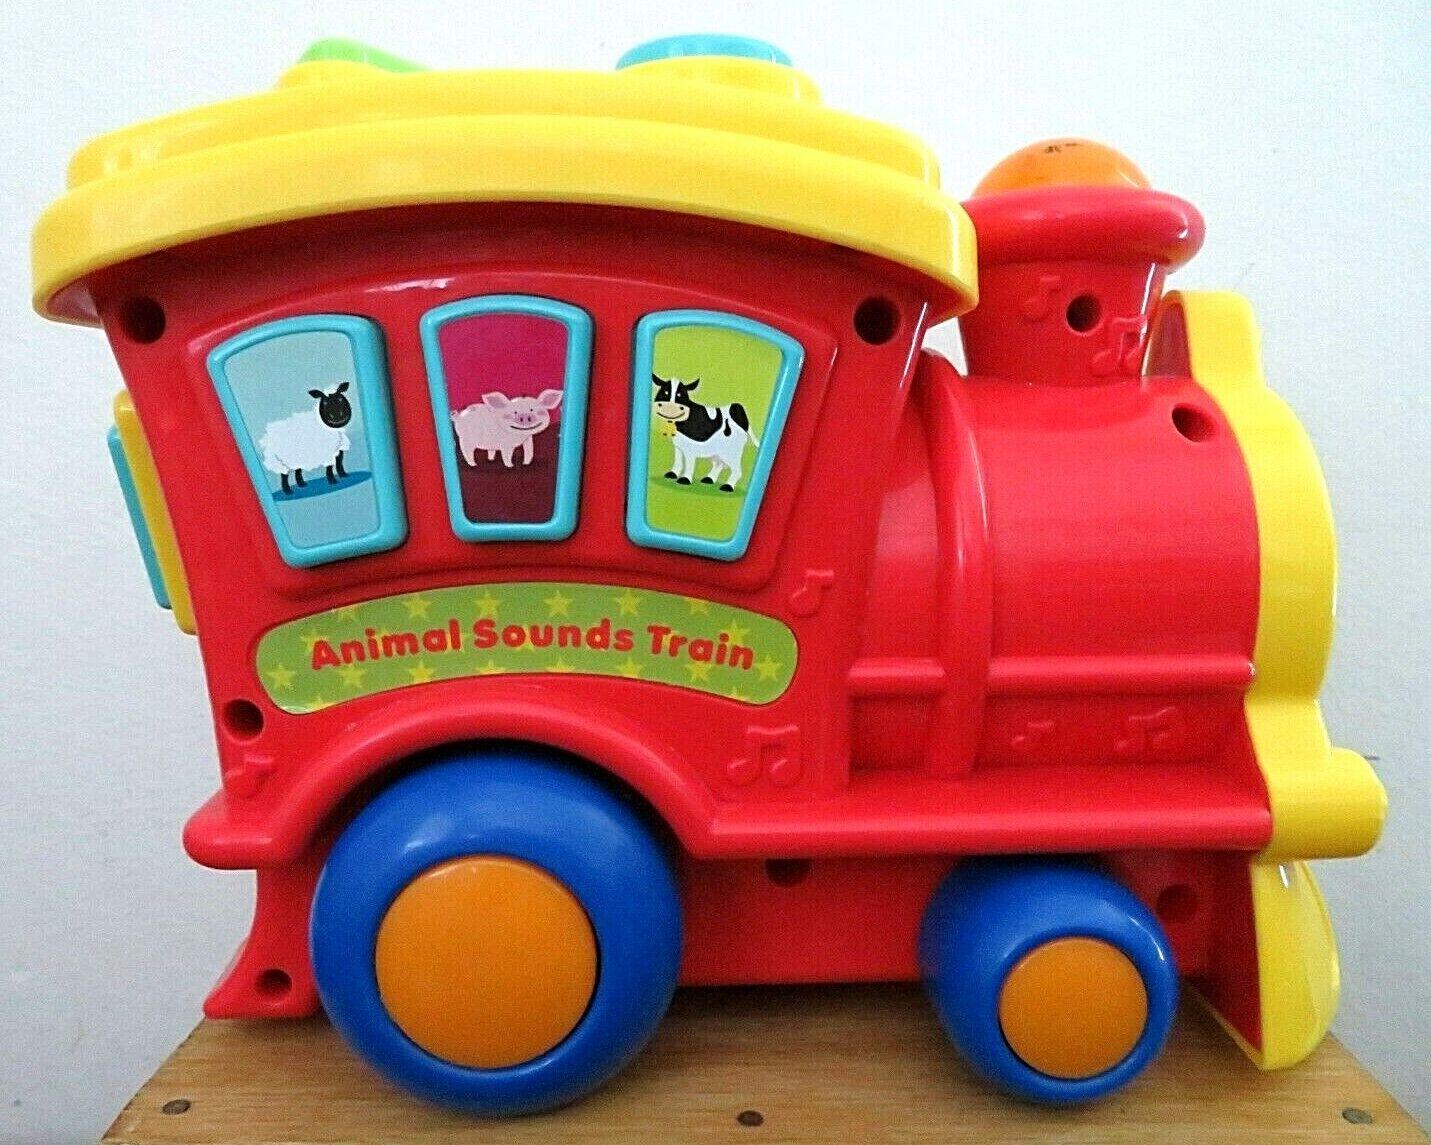 Colorful ANIMAL SOUNDS TRAIN 8 Farm Animal Sounds Educational Pull Along EUC - $19.99